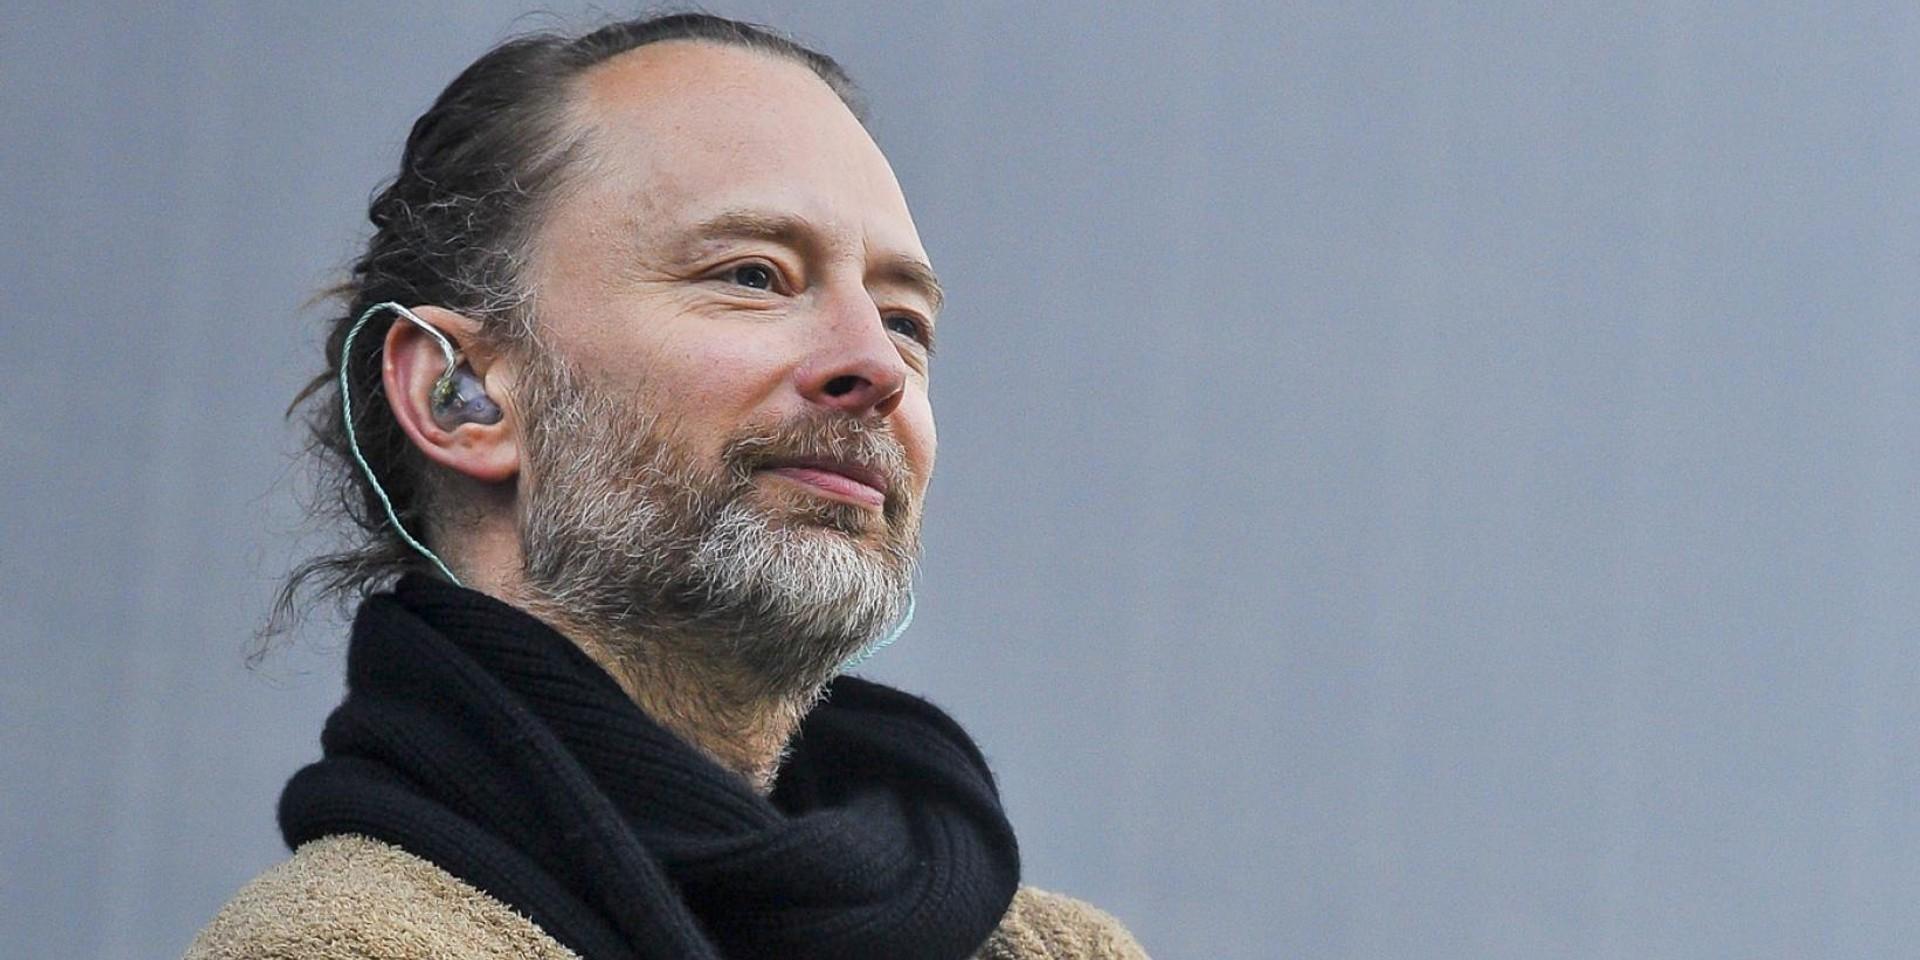 Thom Yorke announces solo album, Anima